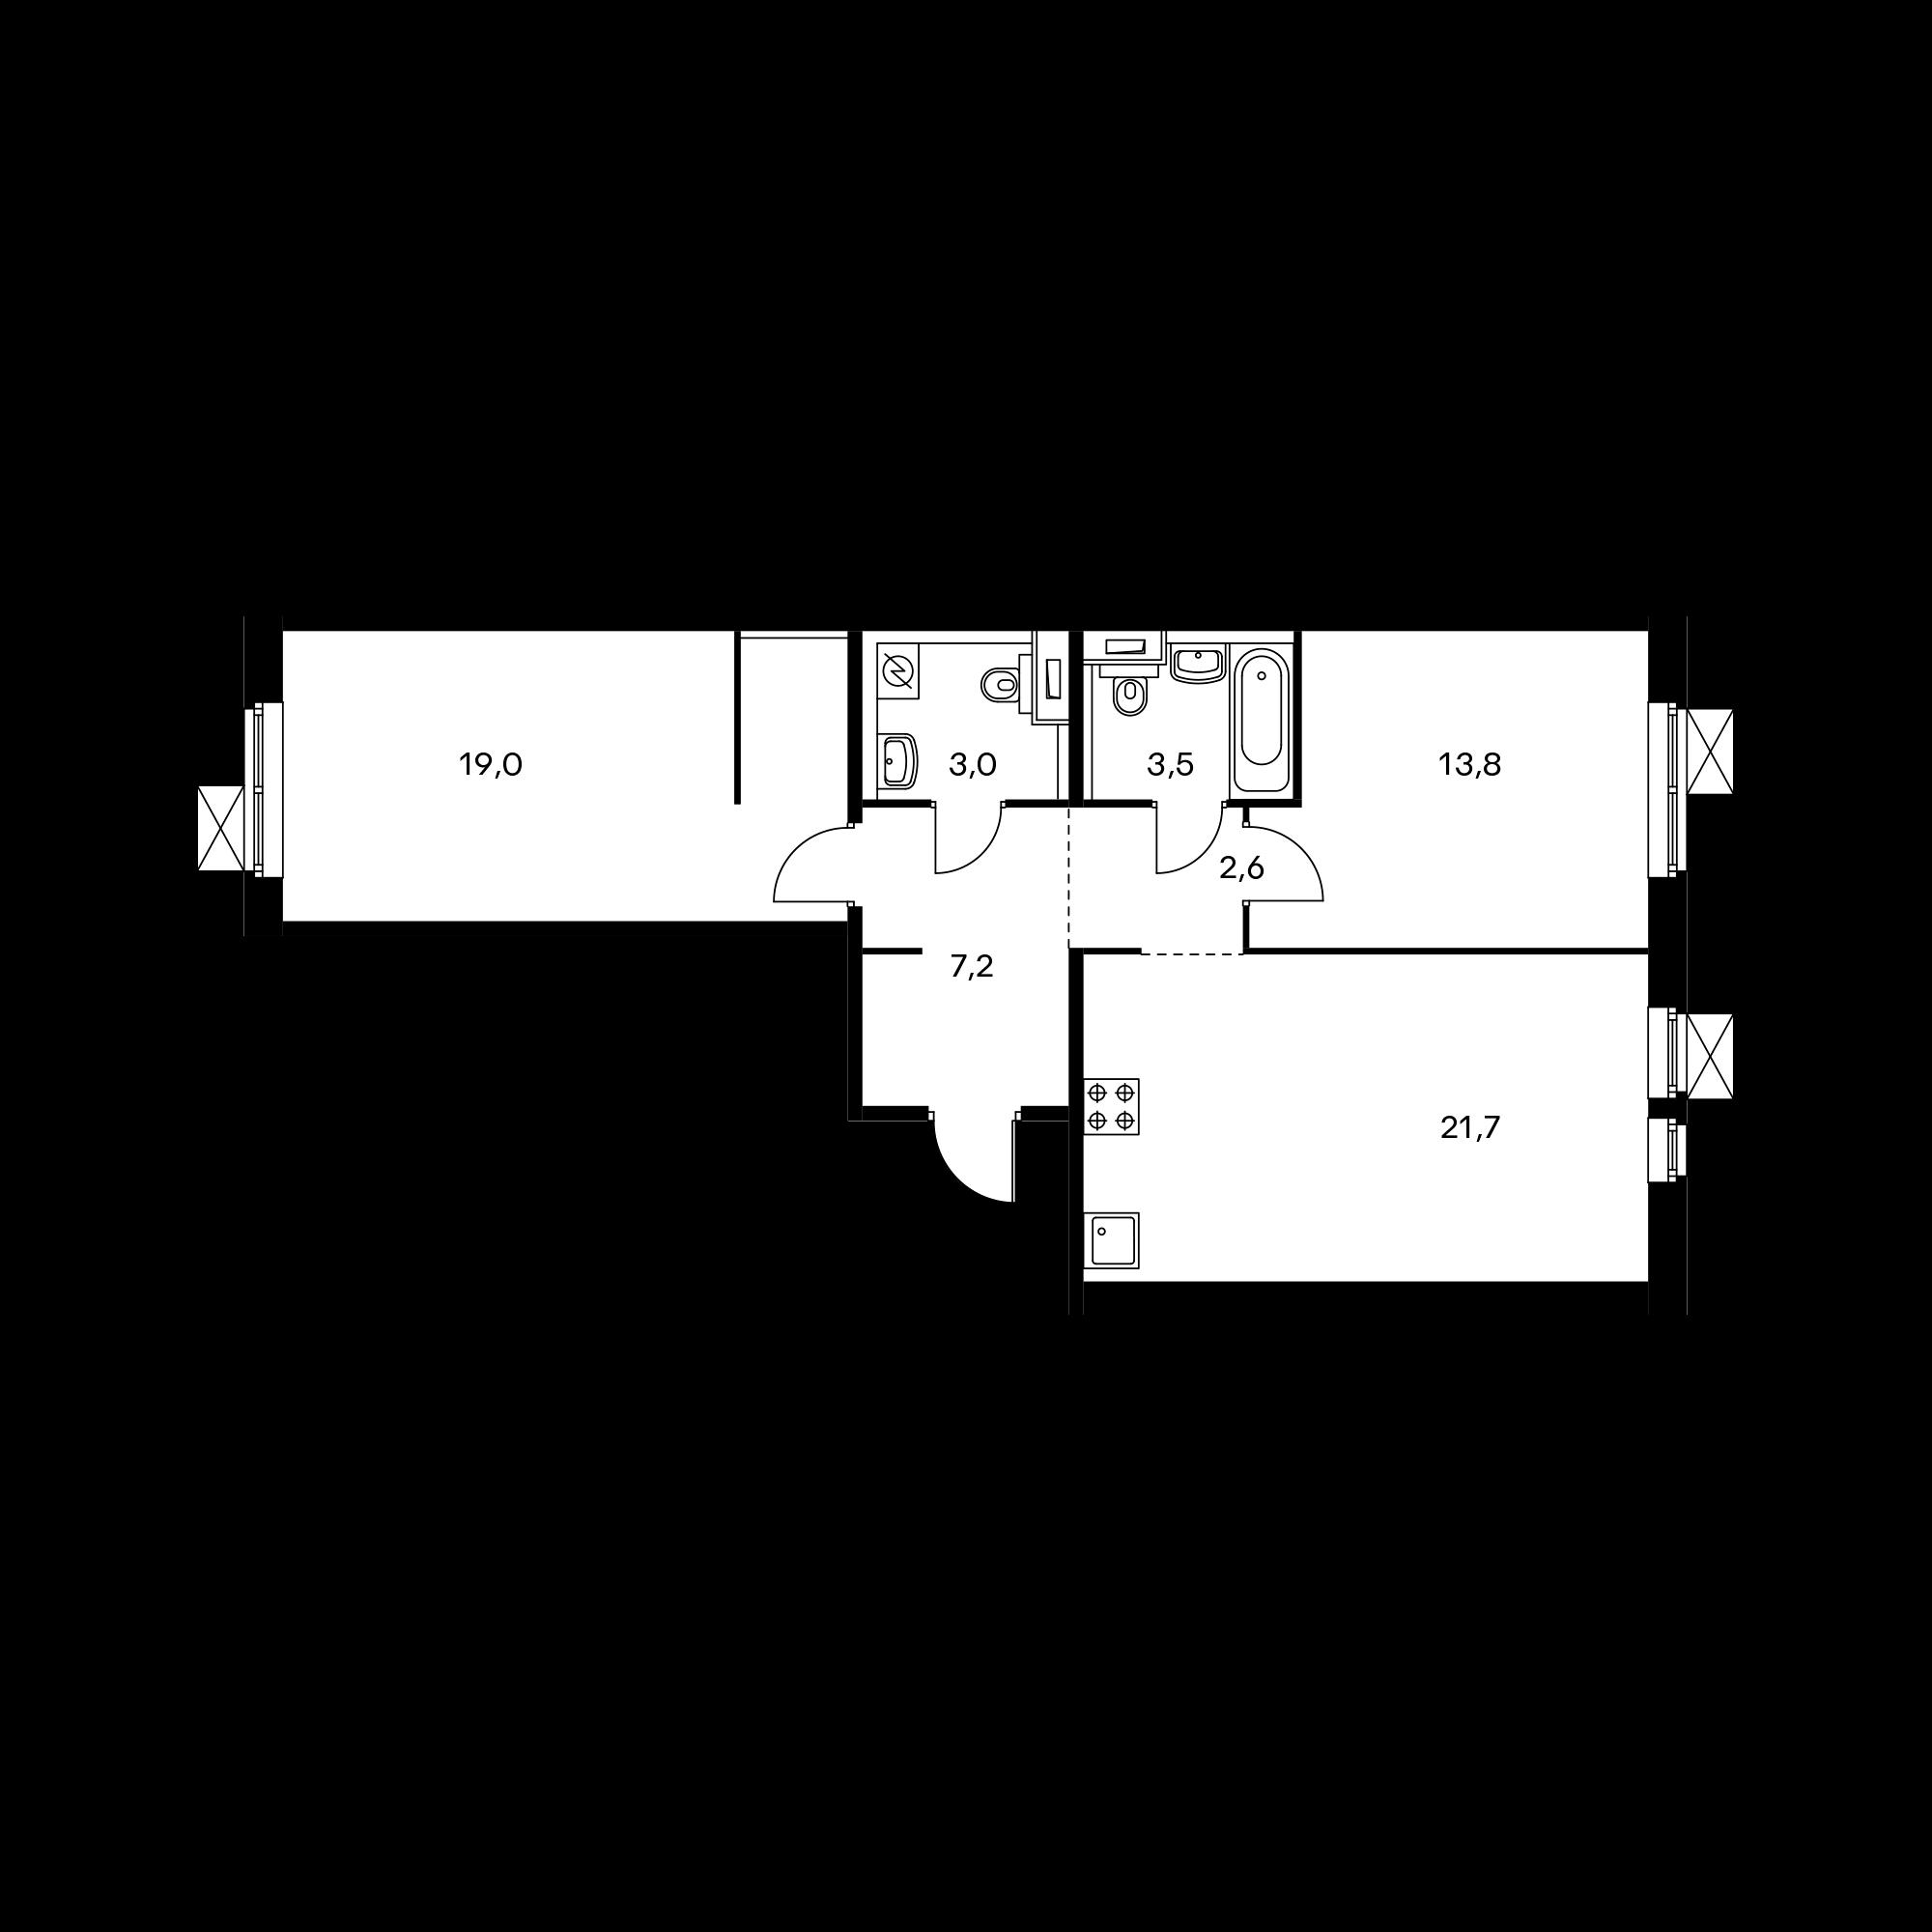 2EL3_7.2-2